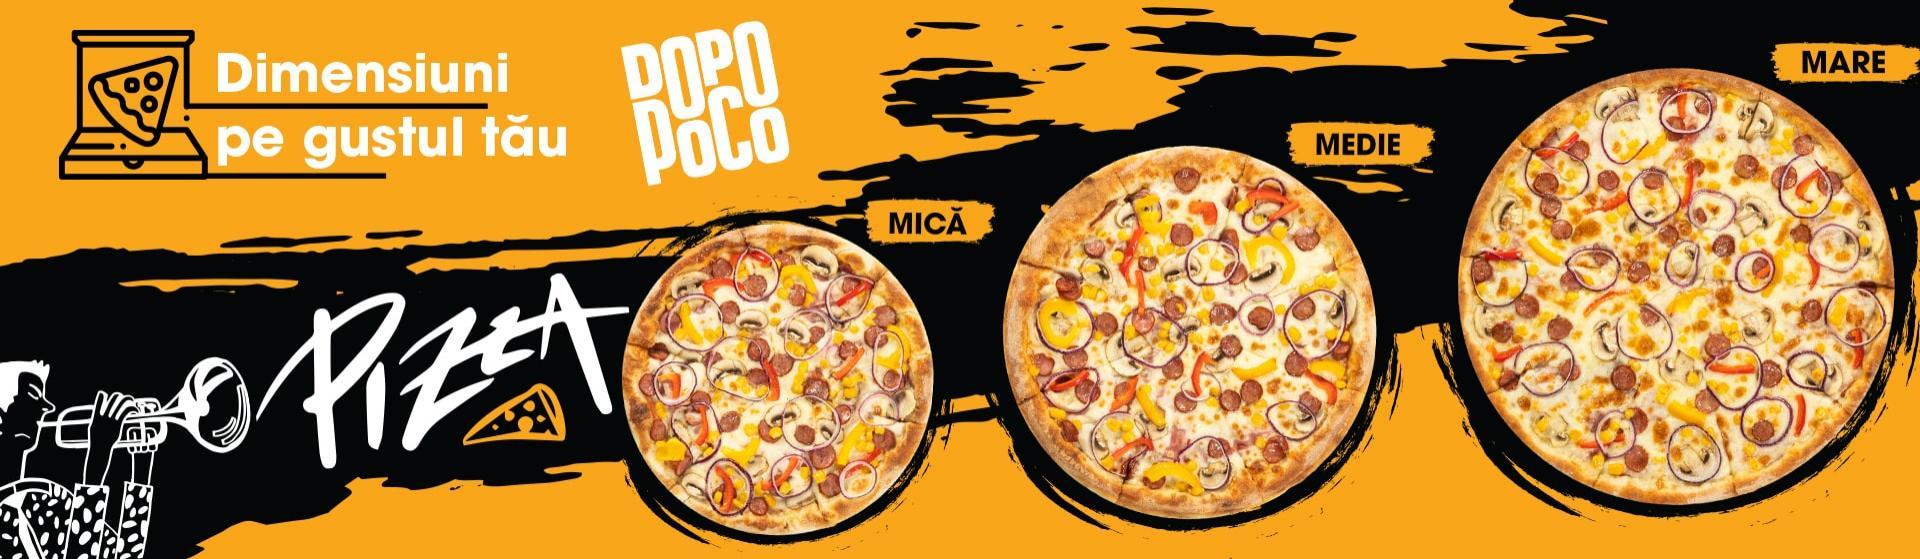 banner-noi-dimensiuni-pizza